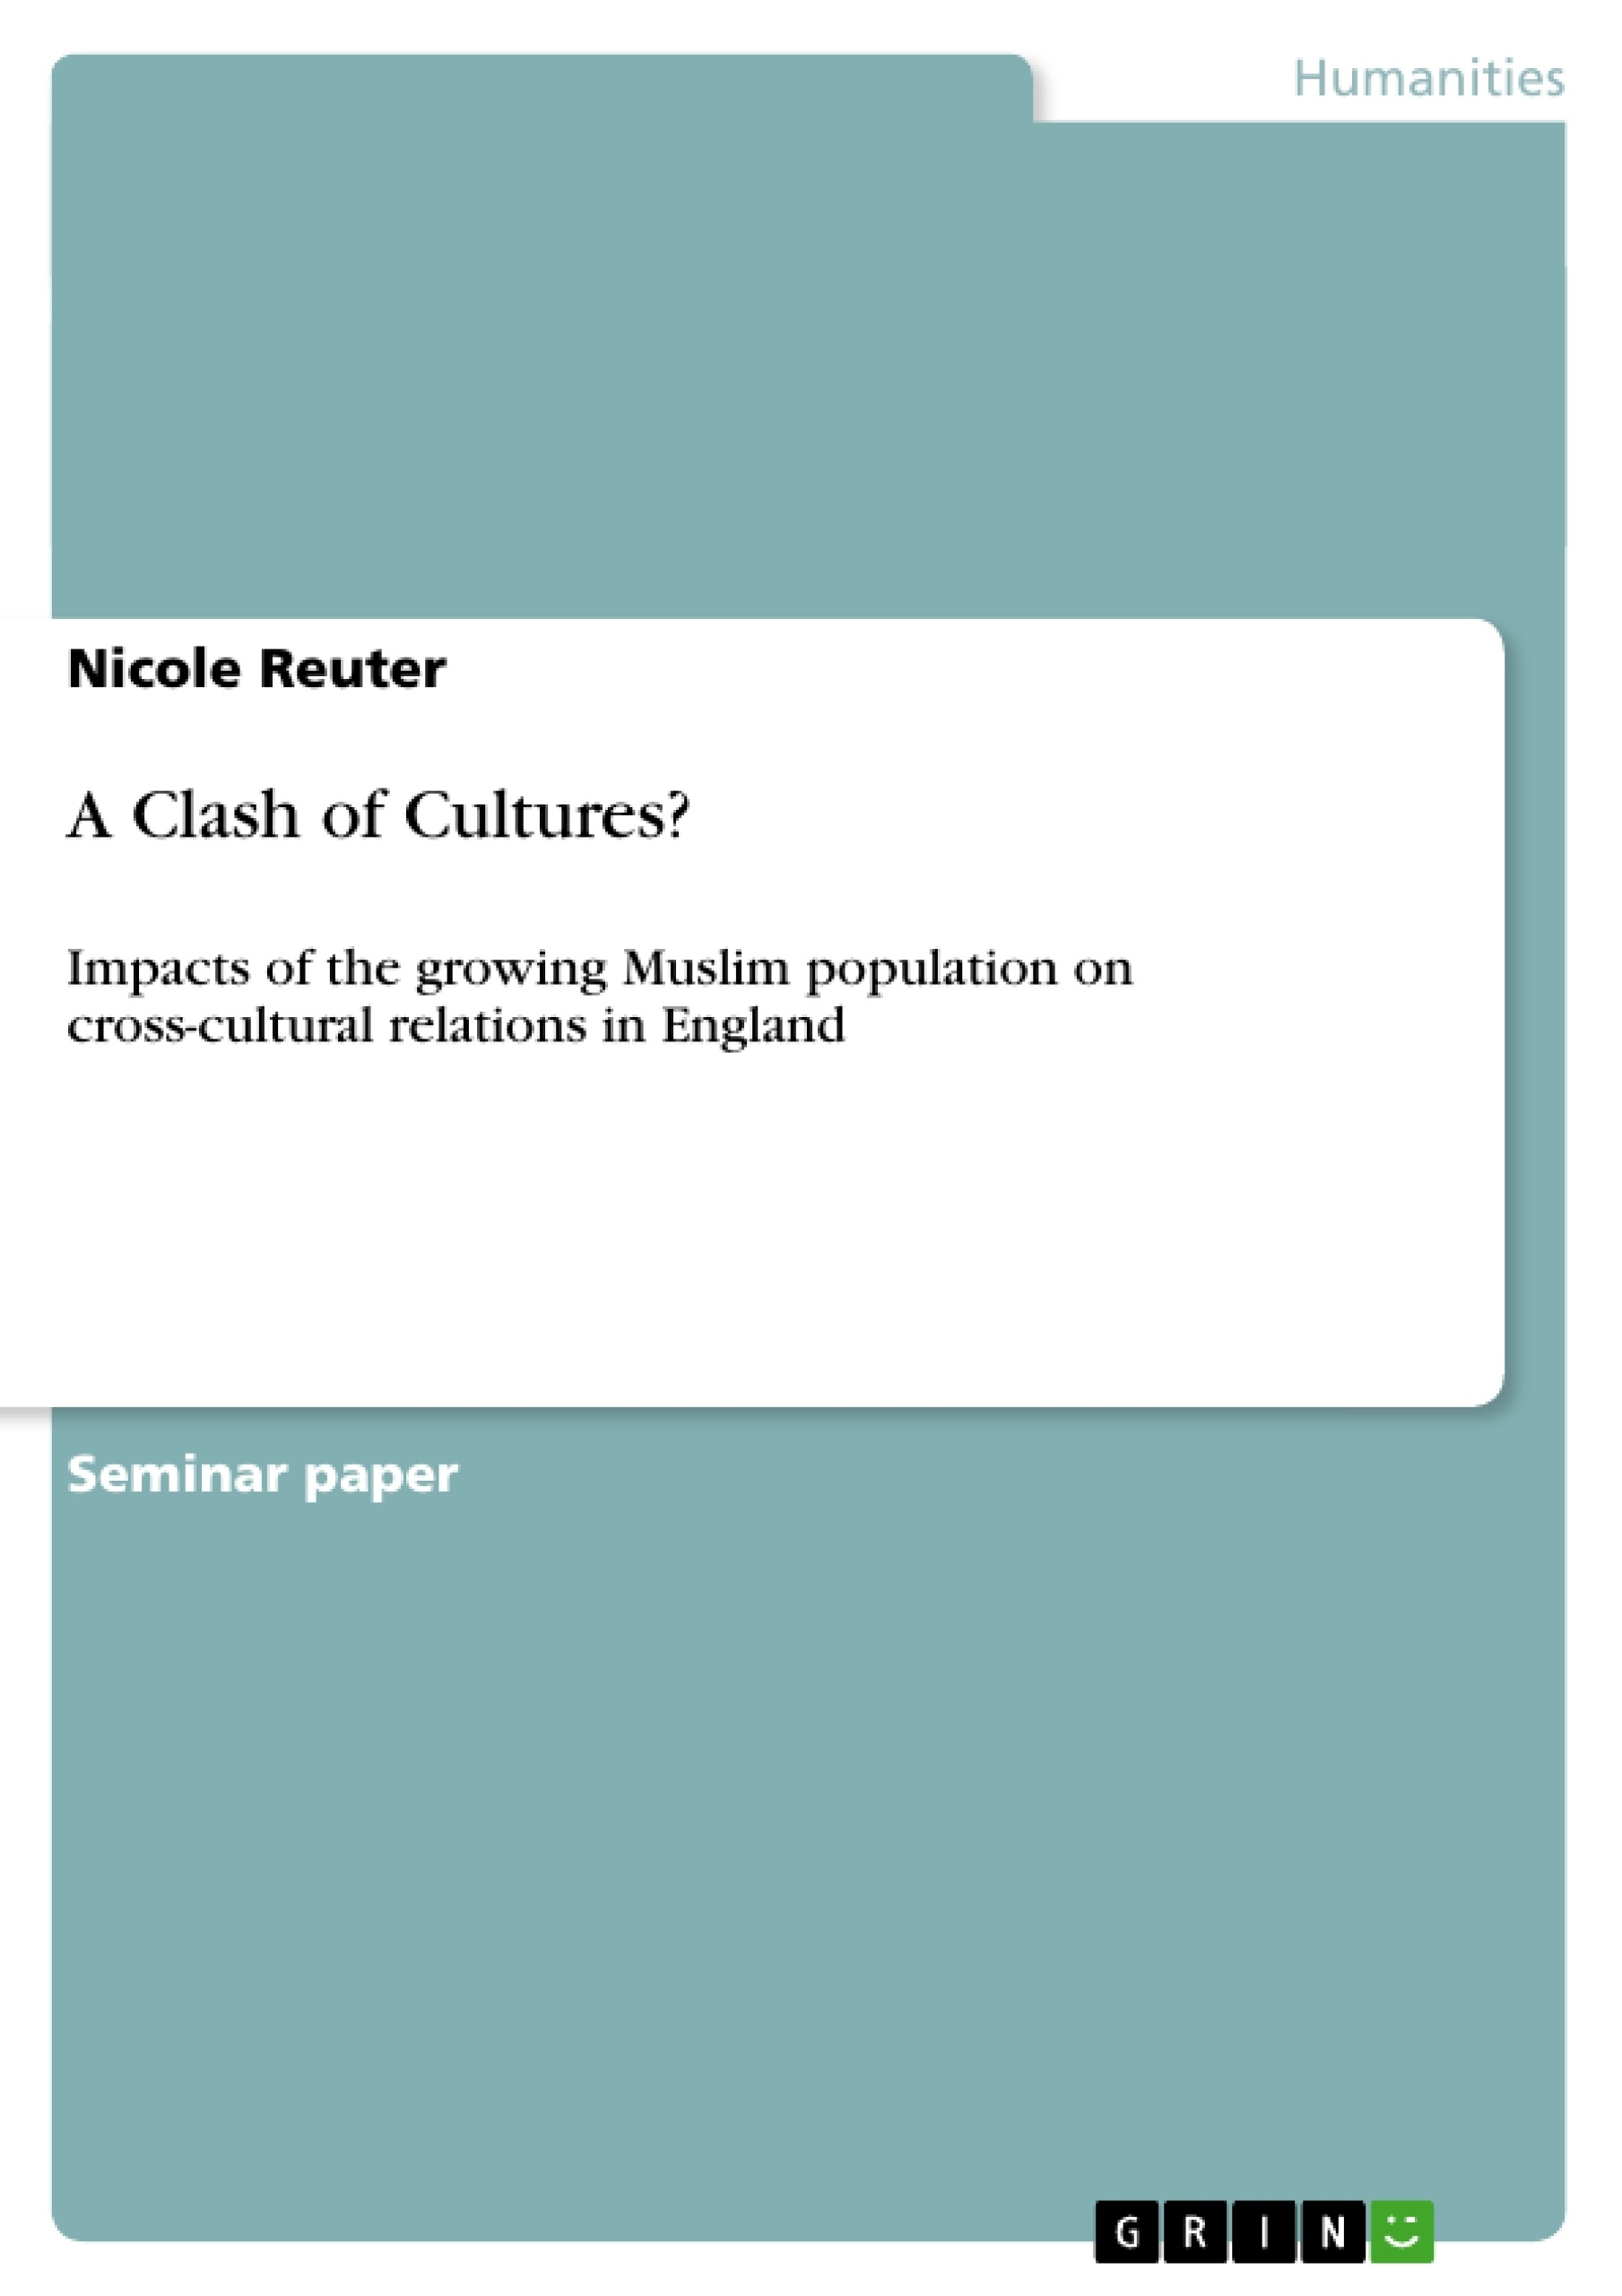 Title: A Clash of Cultures?